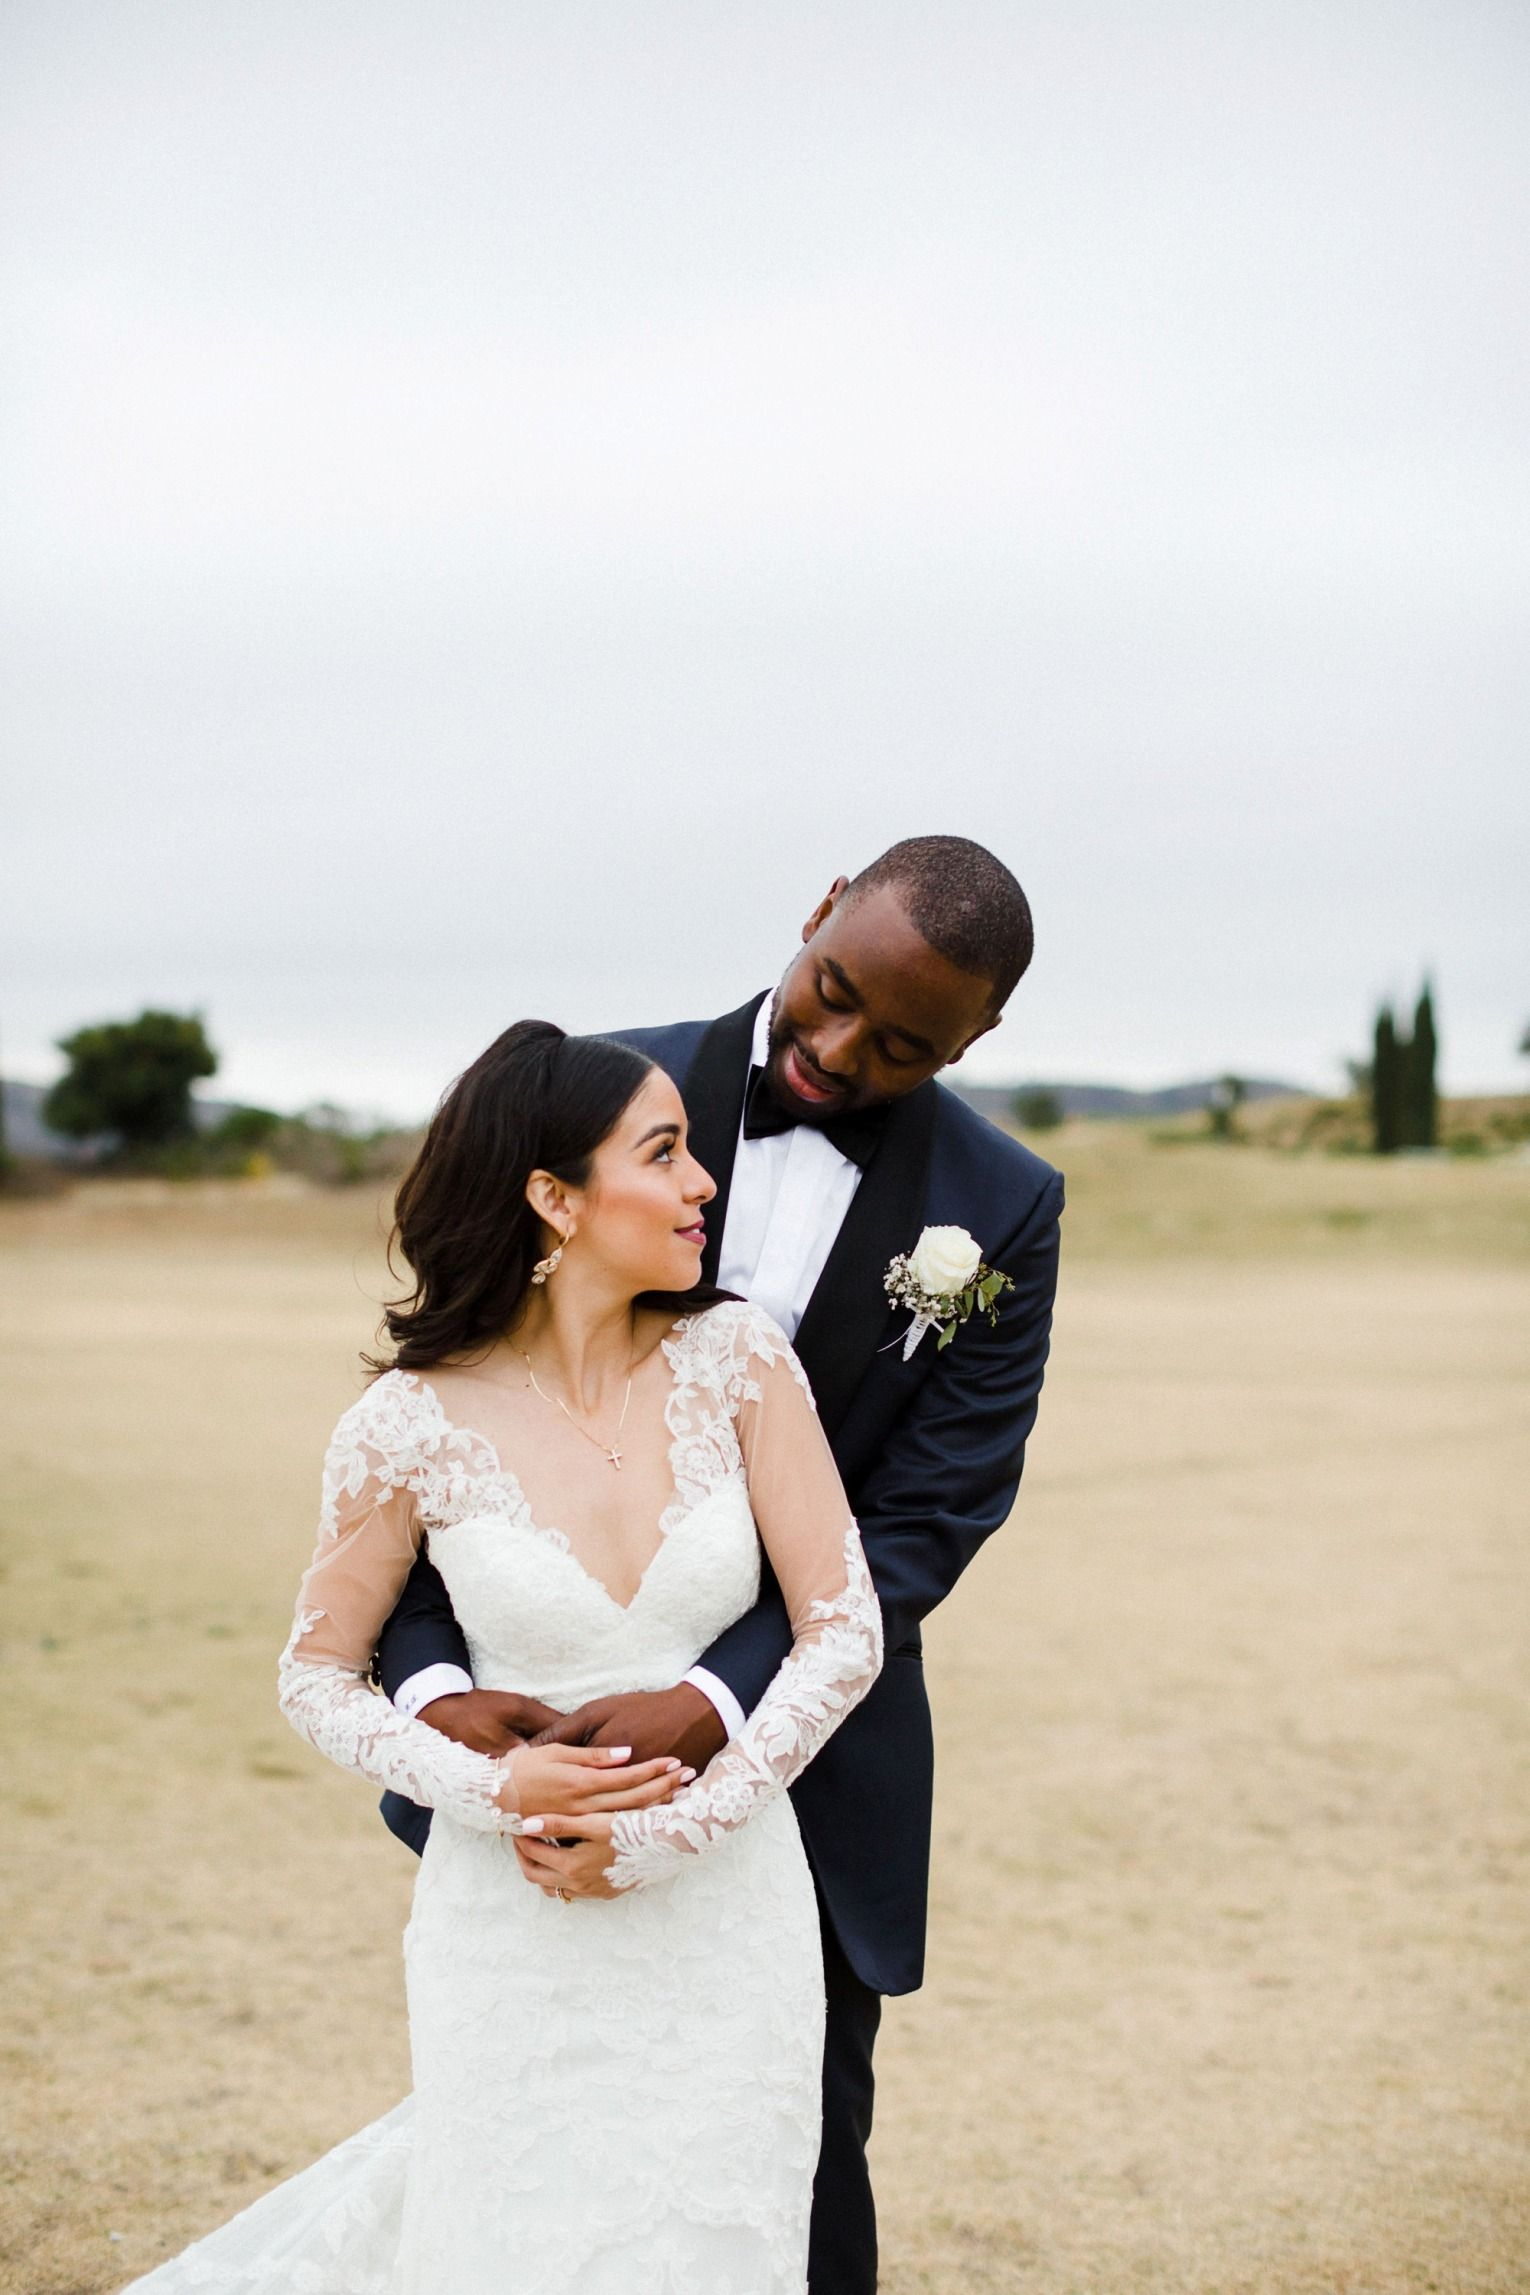 Vellano Country Club Wedding by Priscilla Frey Photography. Wedding ...